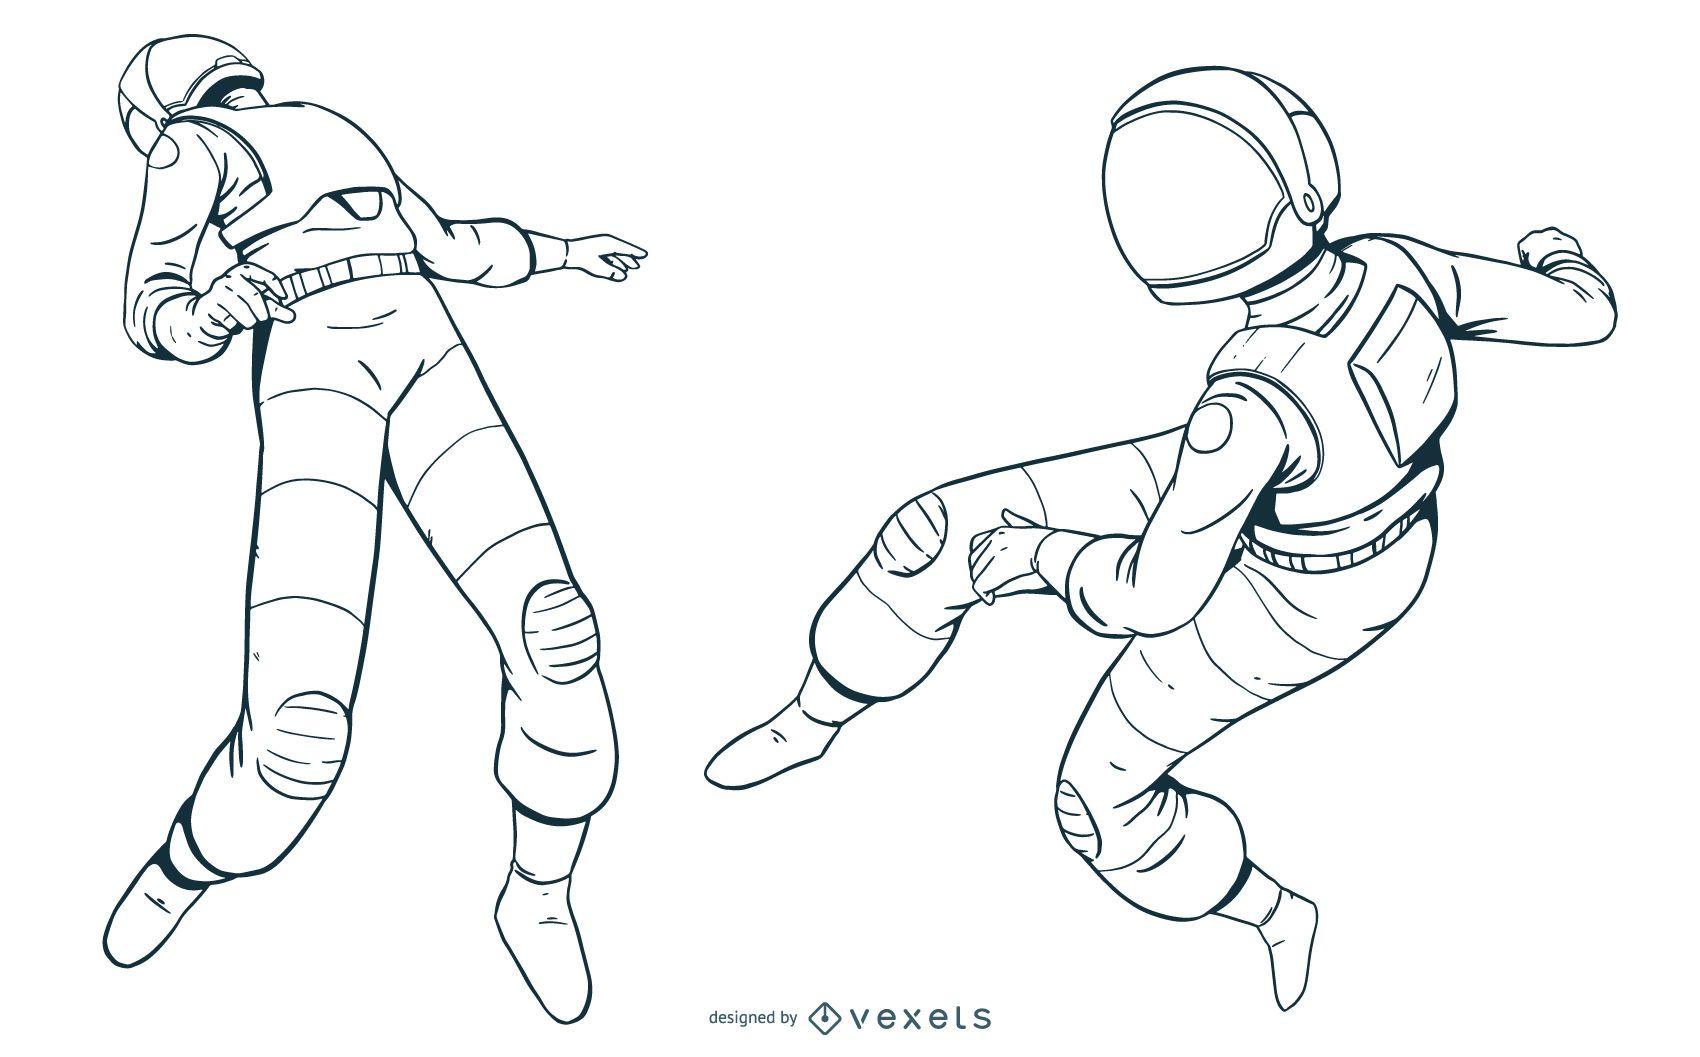 Hand drawn astronaut set